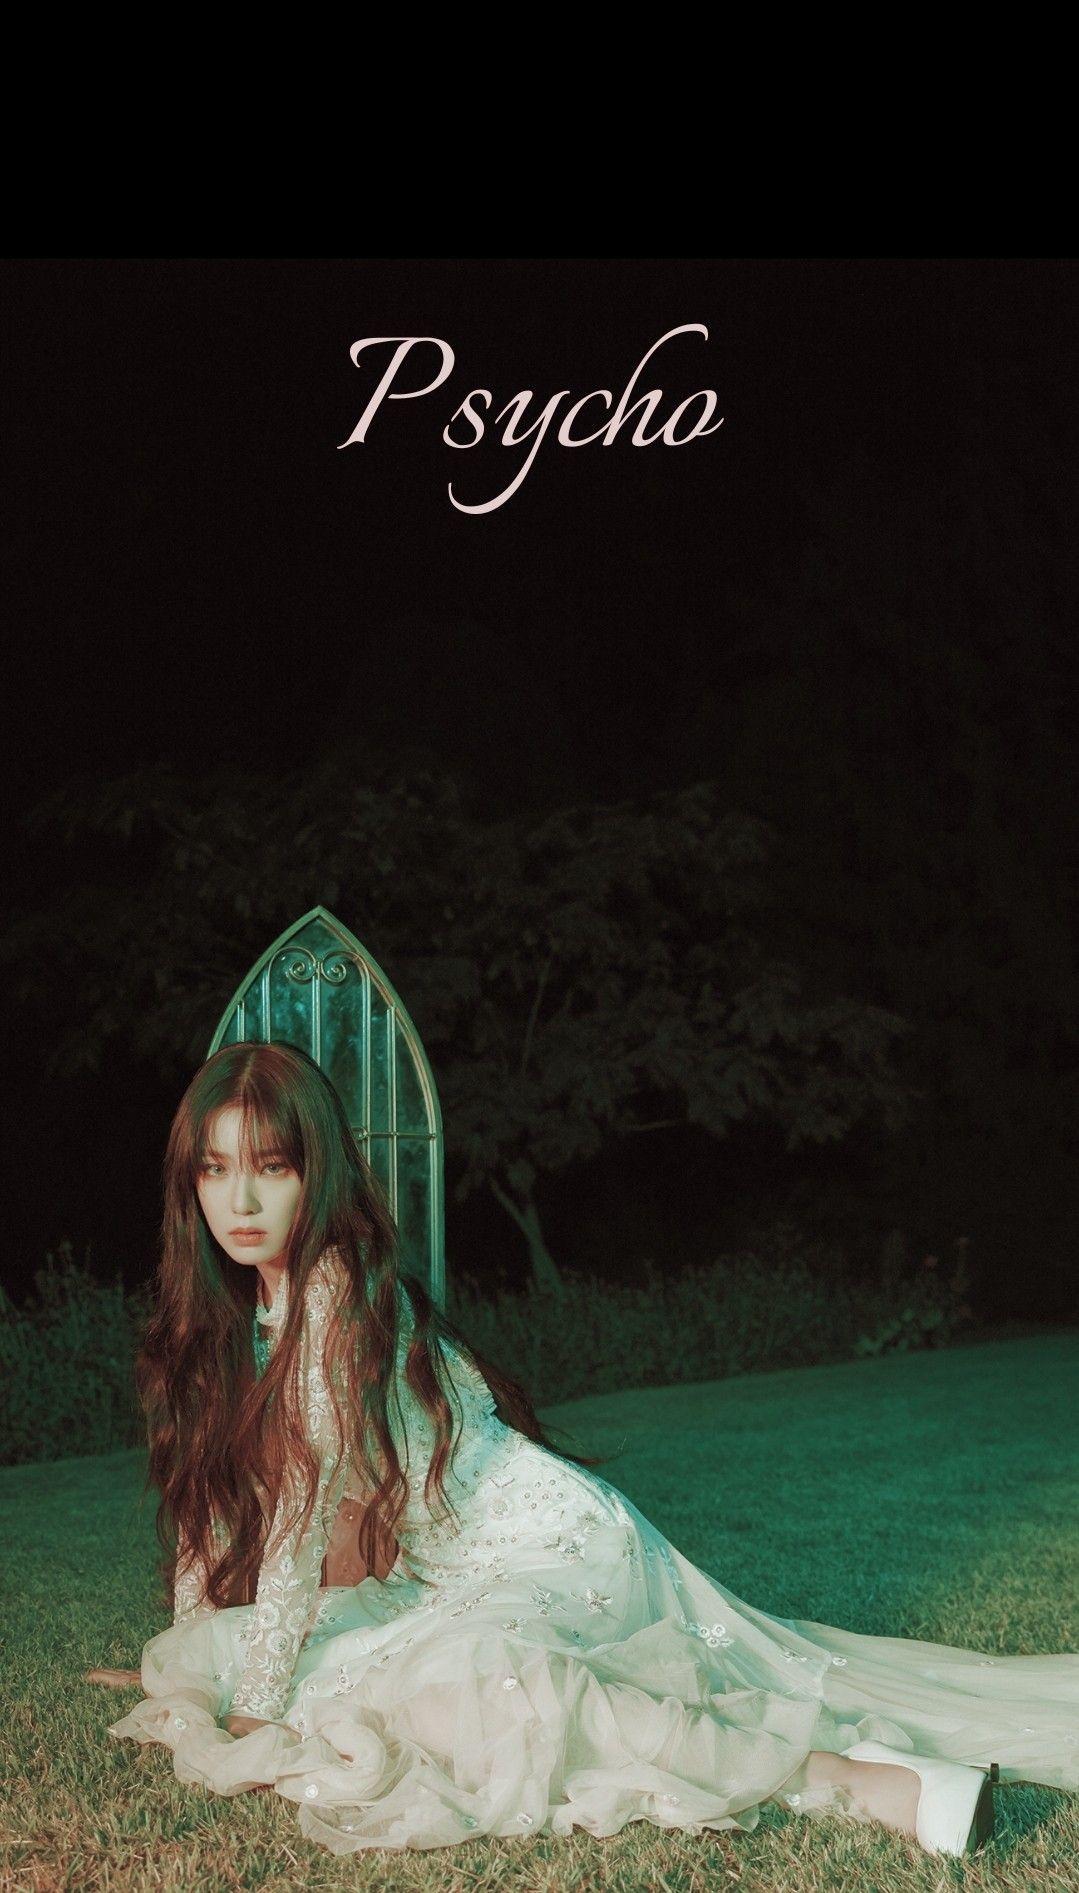 Pin Oleh Popo Poooo Di Iren Red Velvet Gadis Cantik Asia